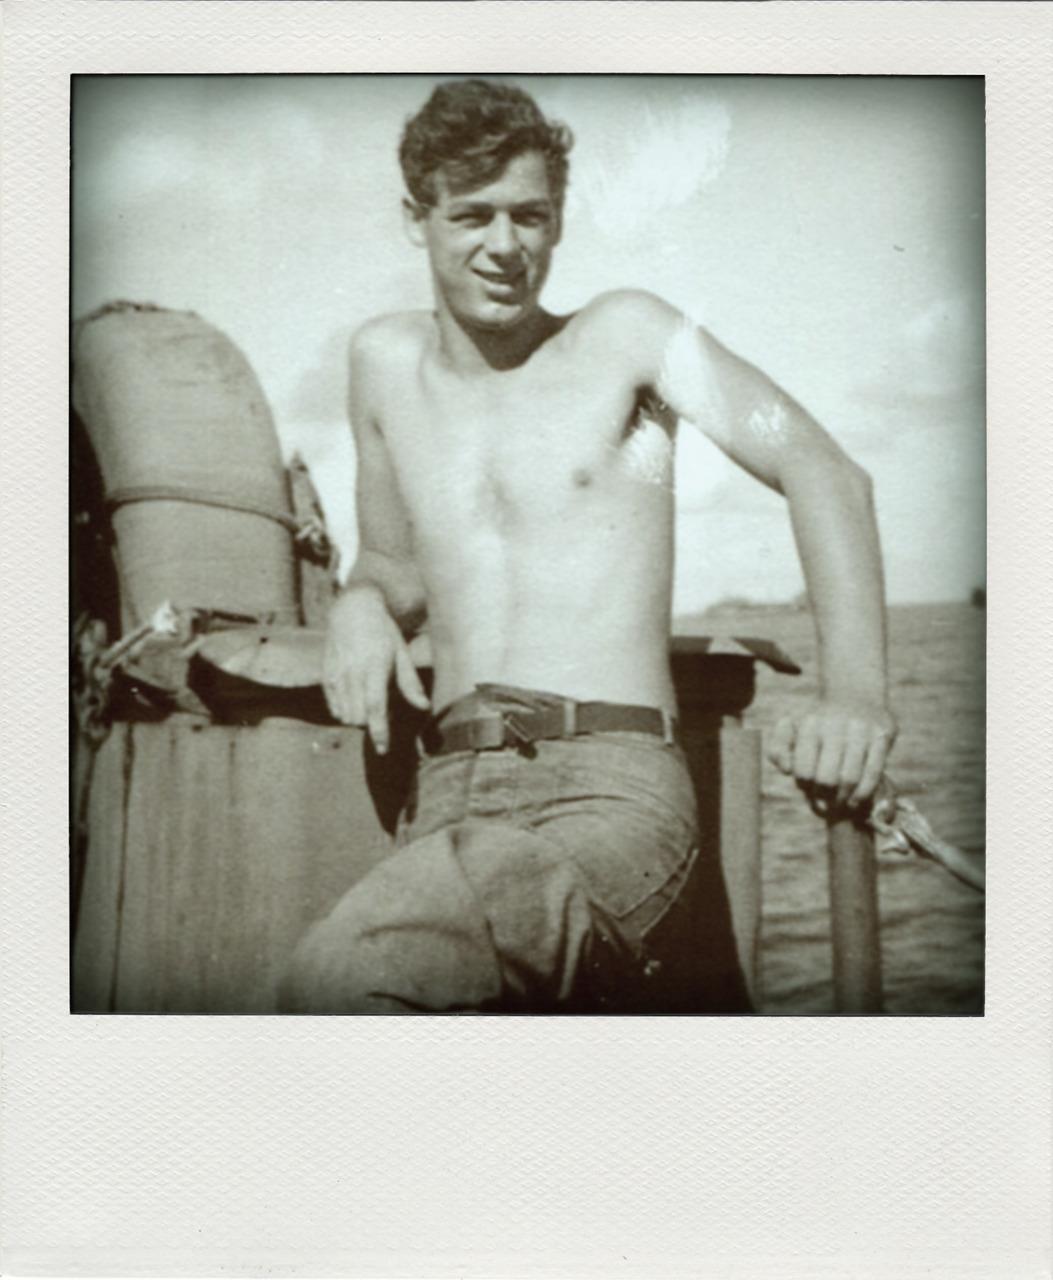 Pin Vintage Beefcake Military Men Images Cake On Pinterest